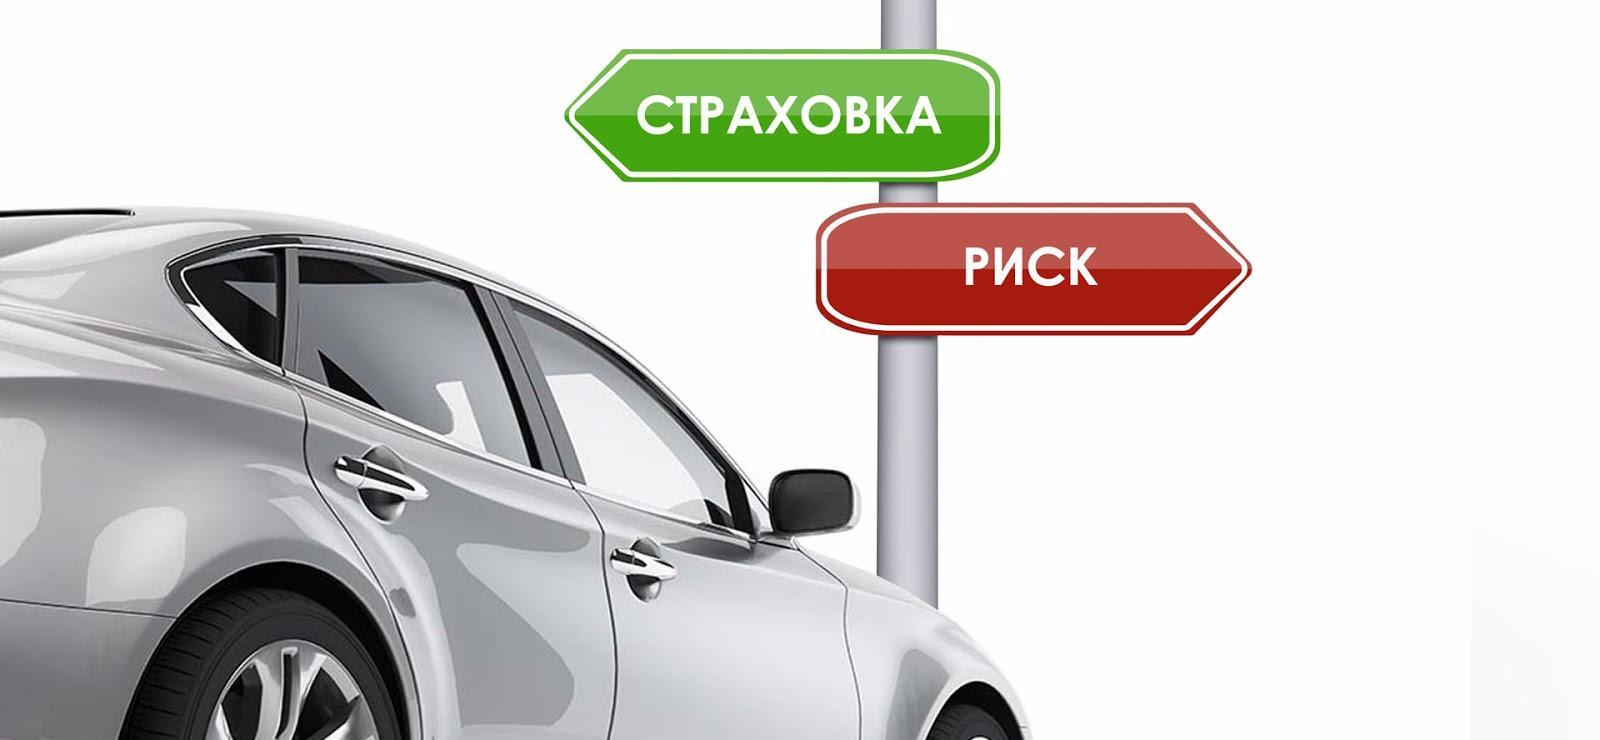 260 000 рублей от государства